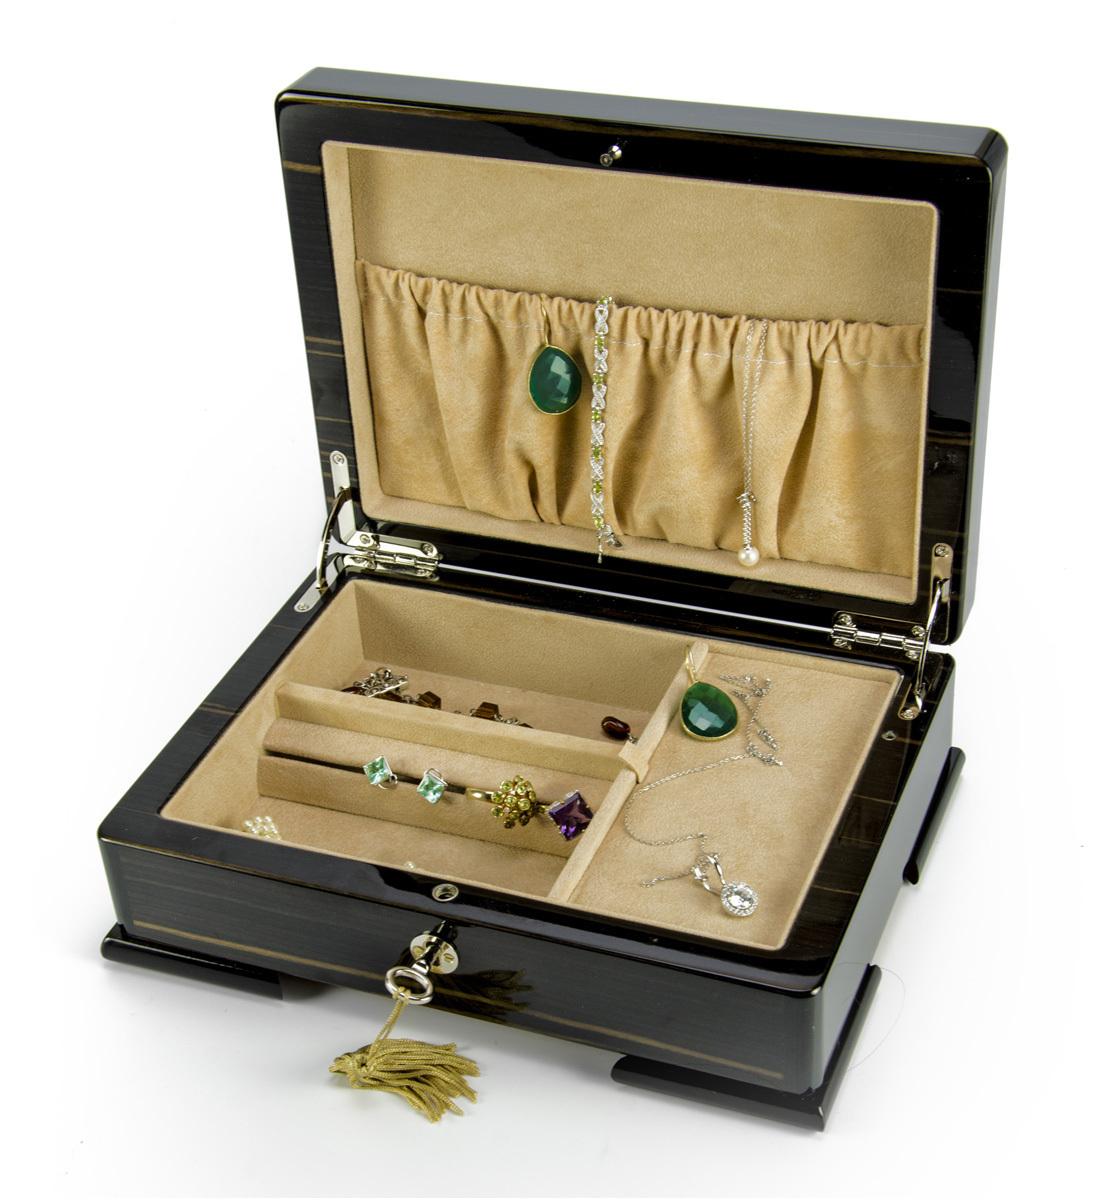 Spacious Ebony Natural Wood Tone 36 Note Hi Gloss Finish Musical Jewelry Box